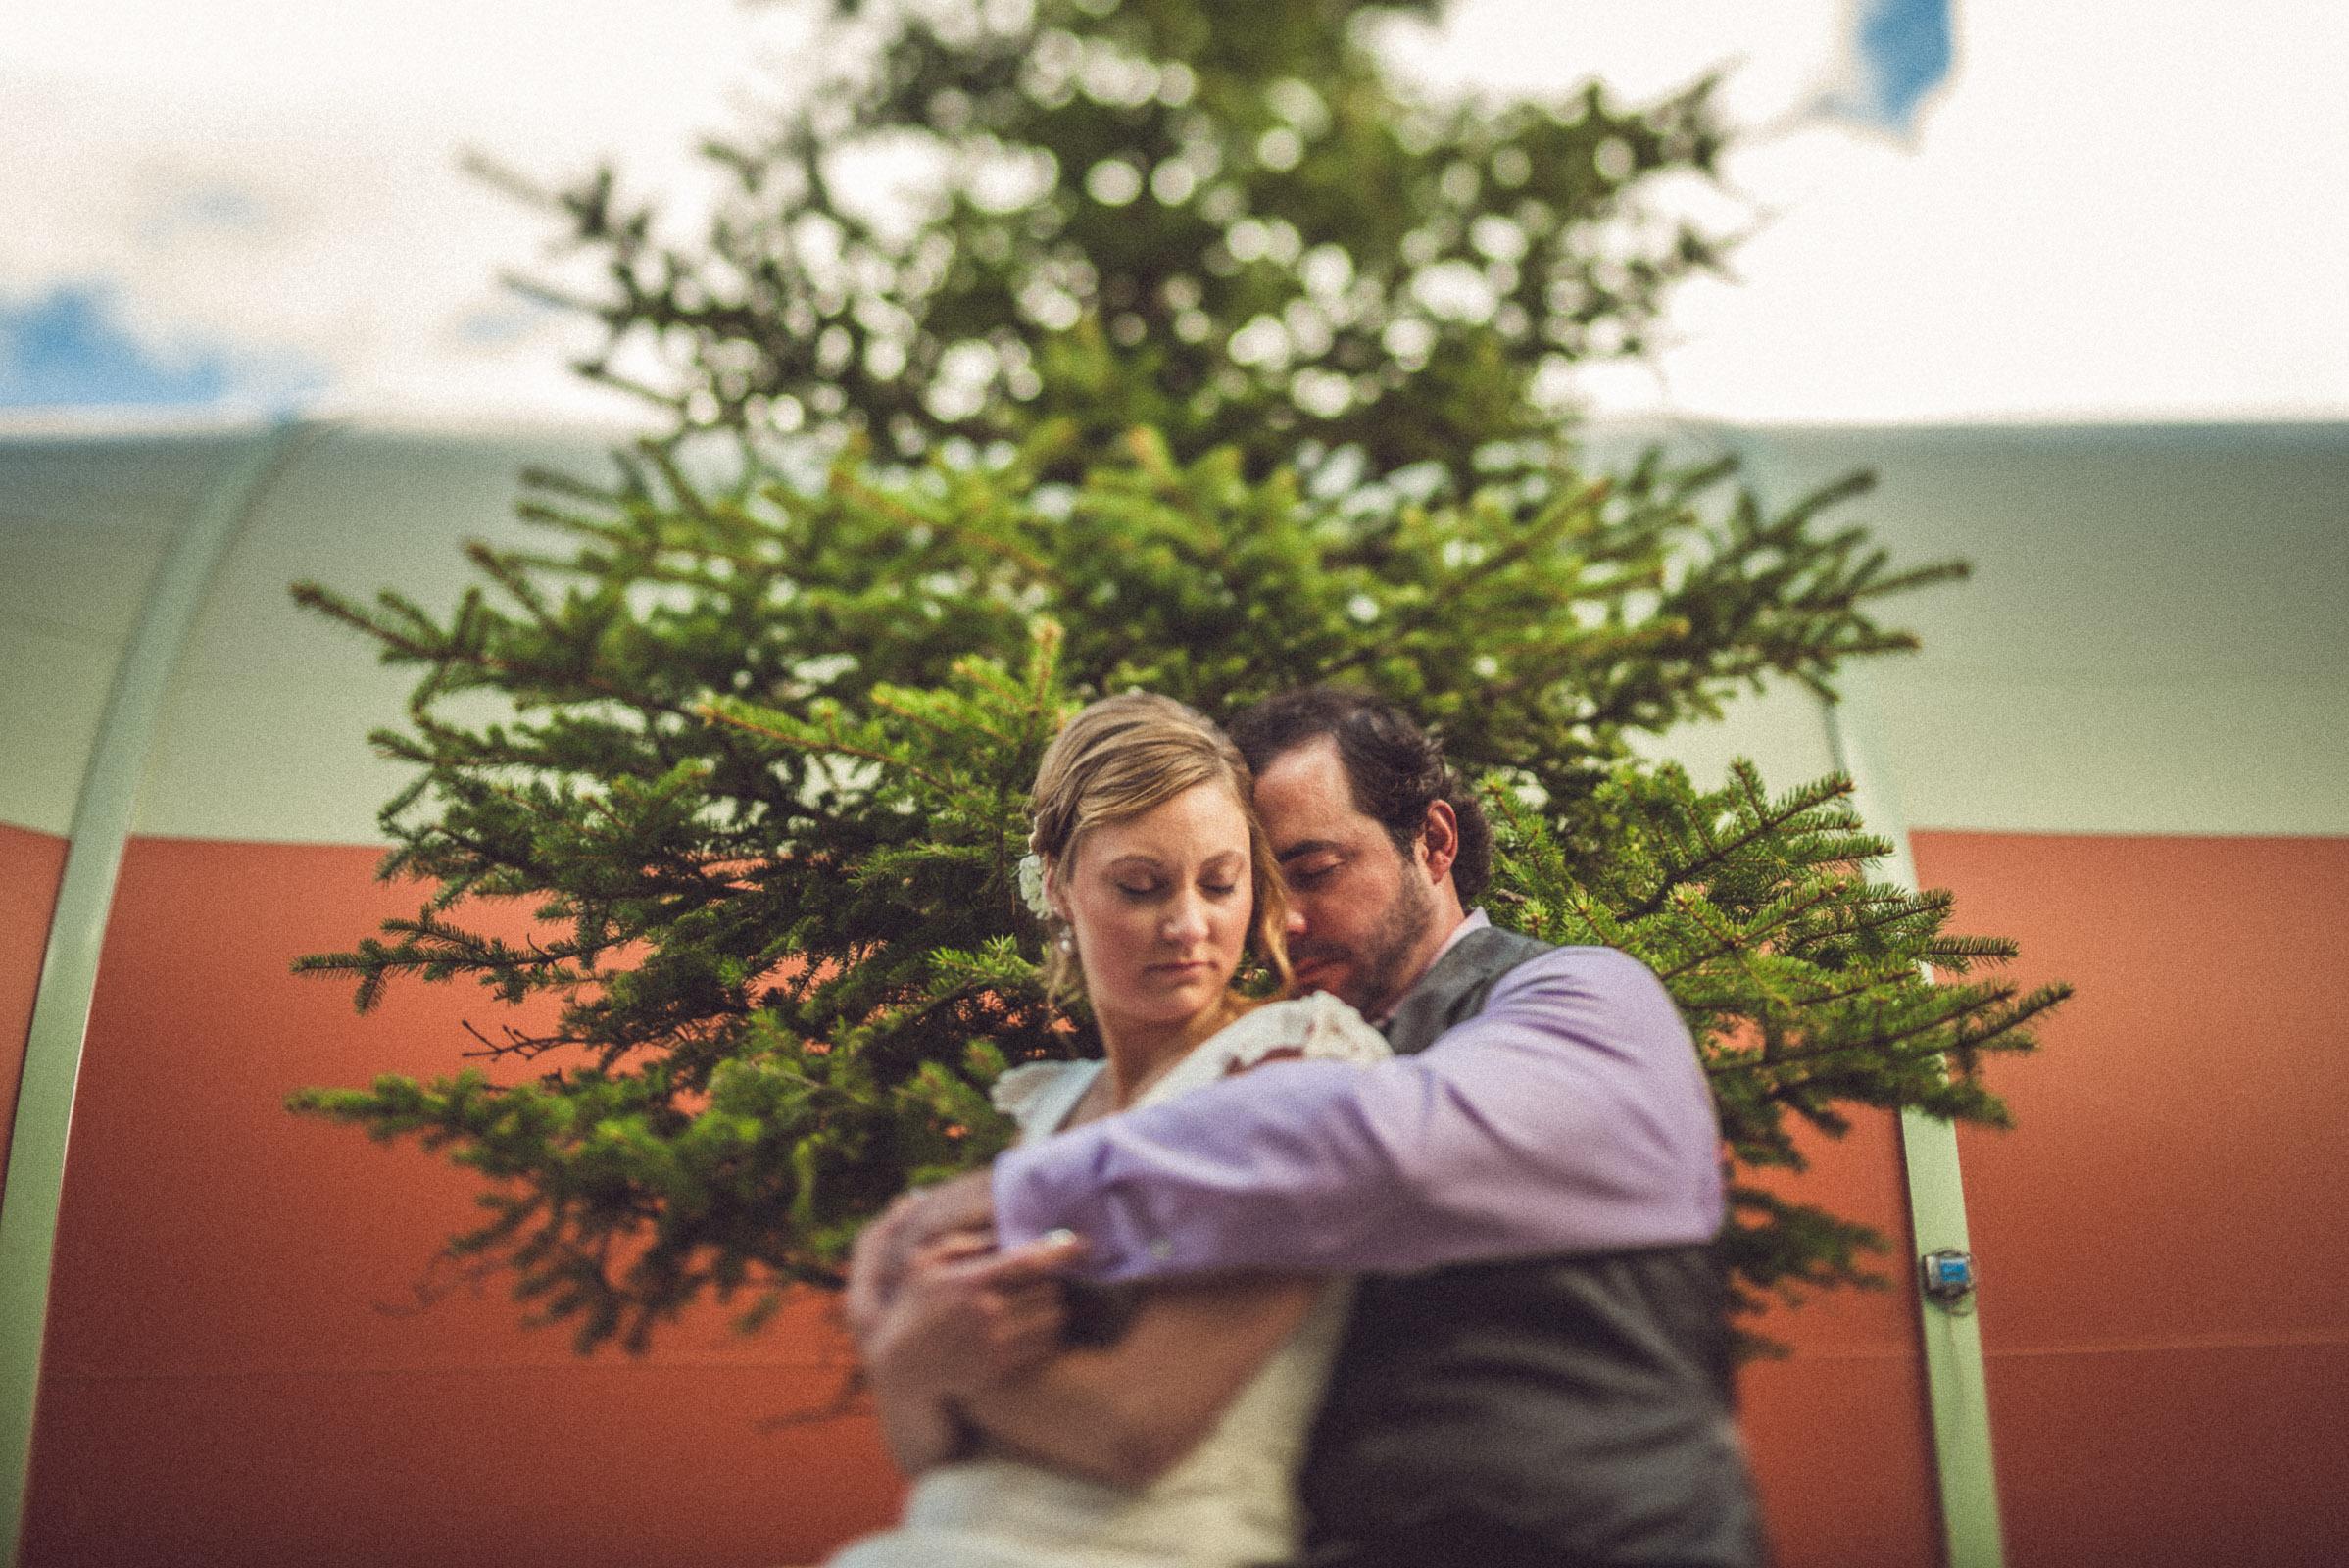 Outdoor wedding in Keystone